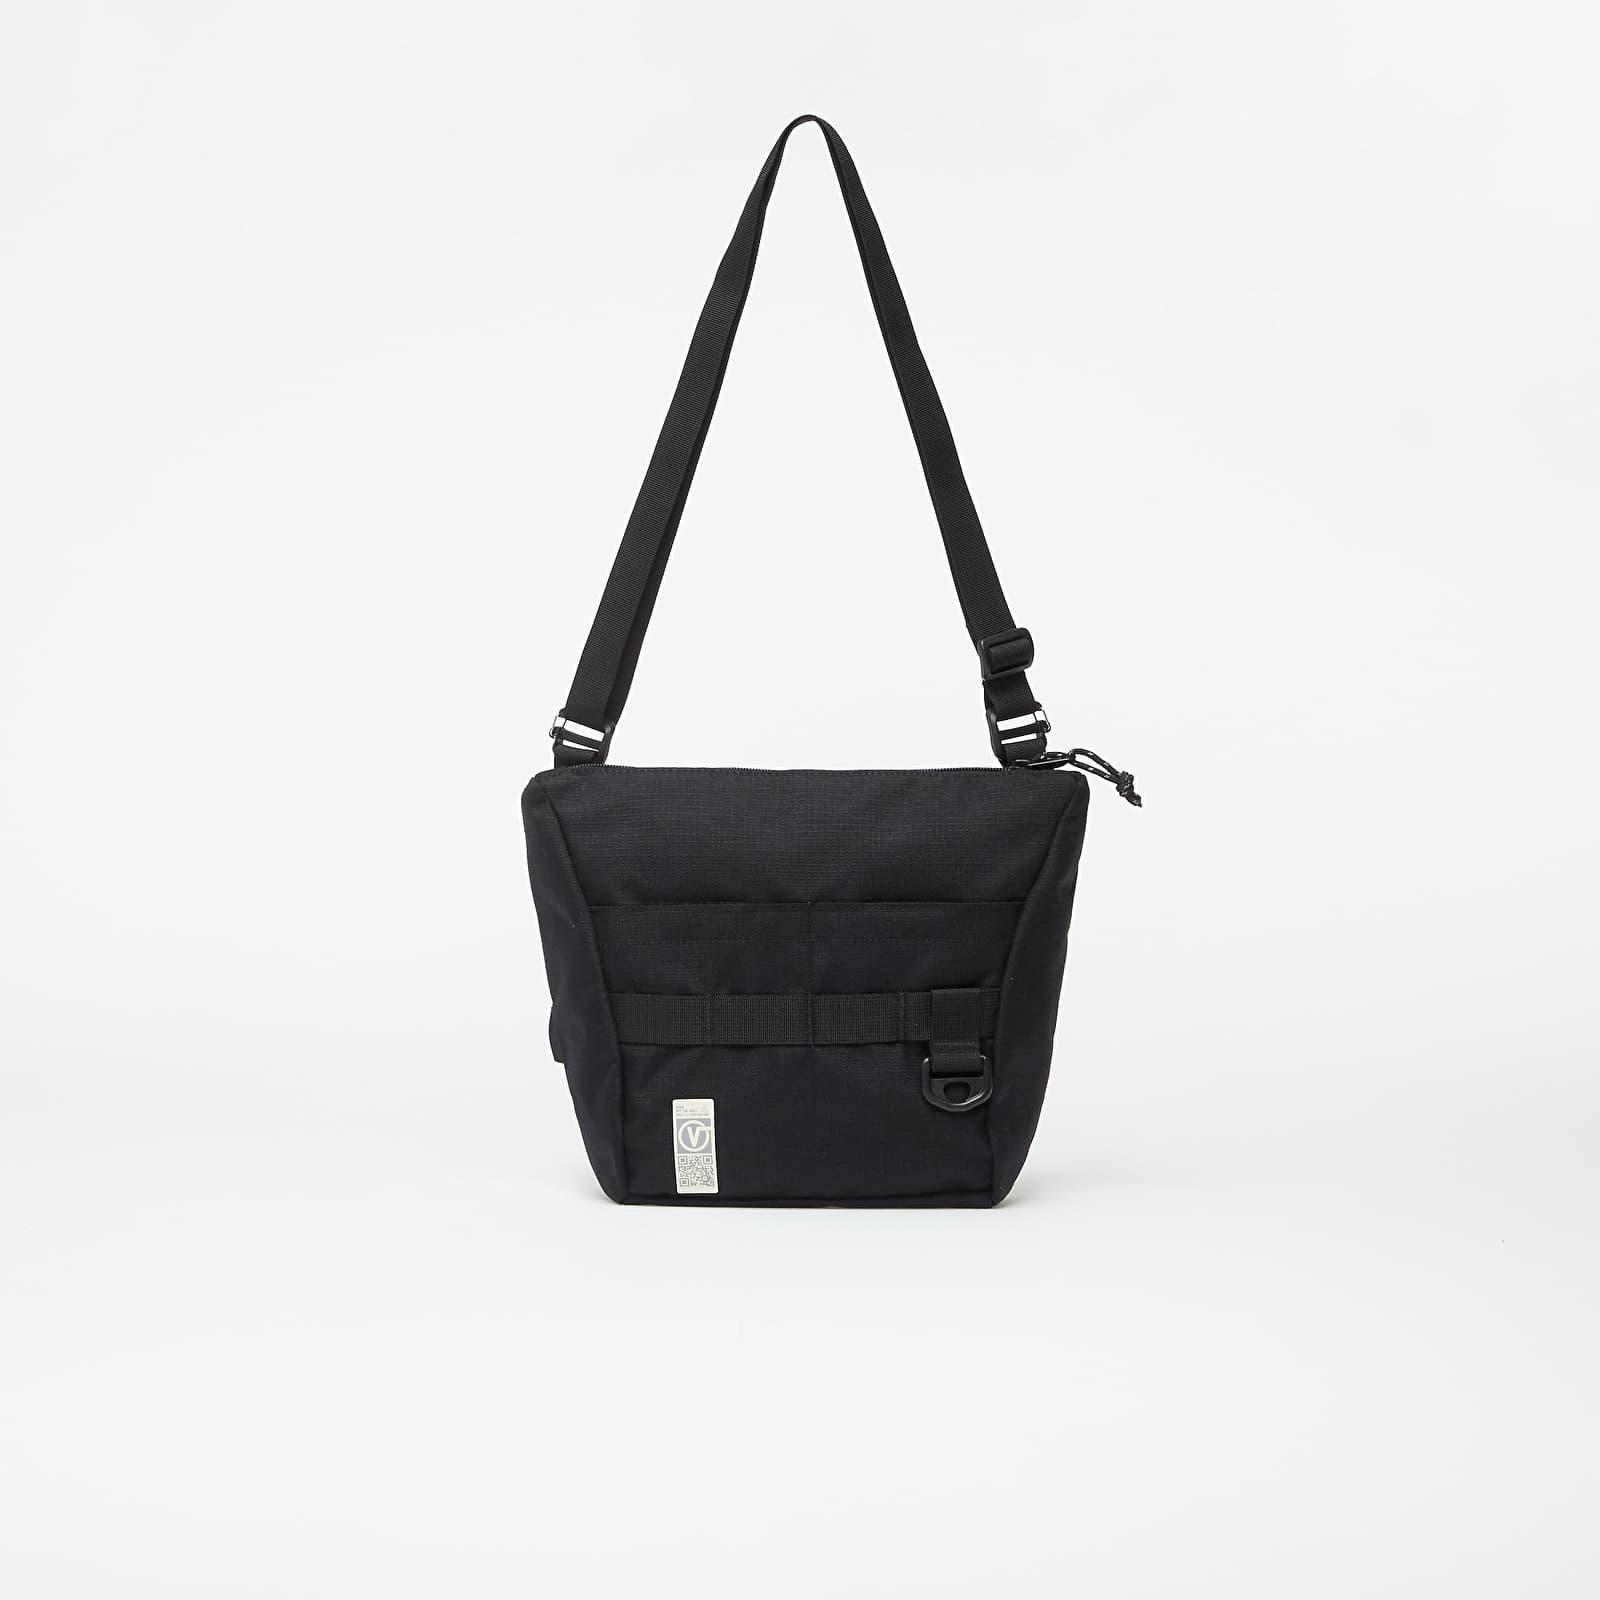 Tašky cez rameno Vans Quick Response Shoulder Bag Black Ripstop